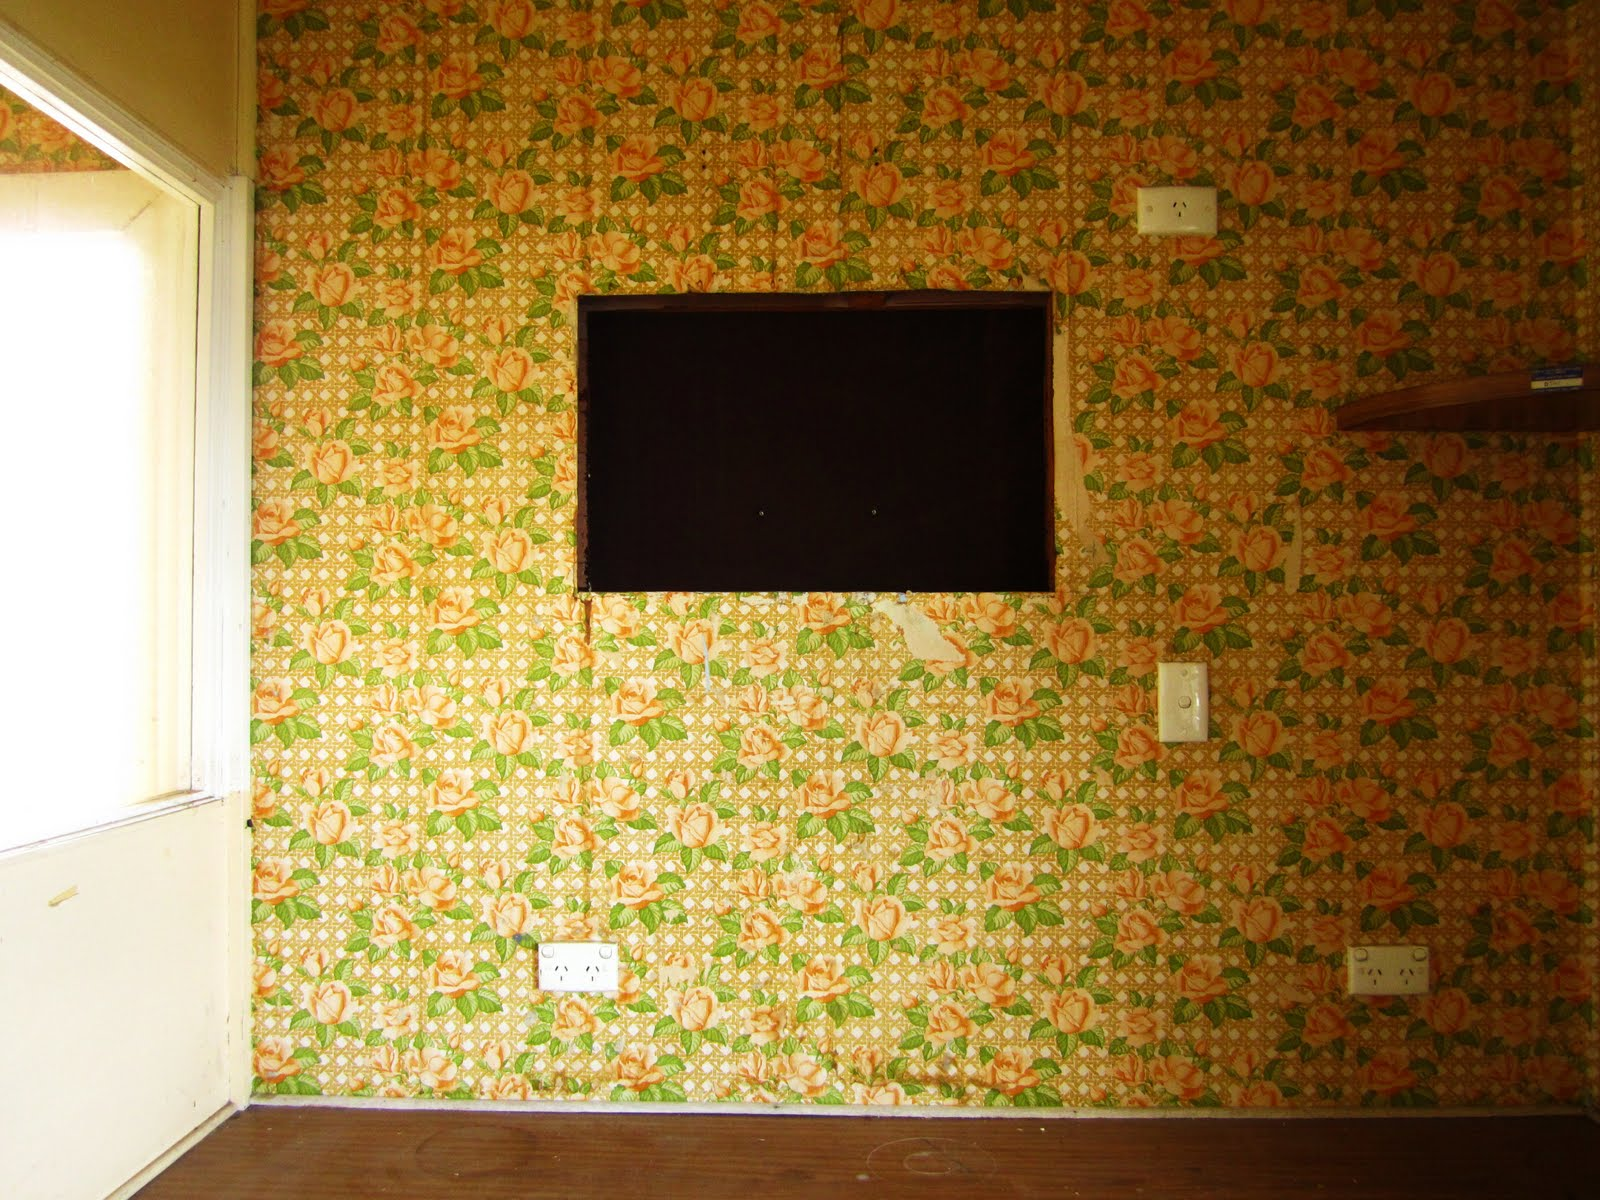 http://1.bp.blogspot.com/_WJjc0N1hIH4/TEuVRcZSnUI/AAAAAAAAMDQ/51M2zwe78b0/s1600/old+wallpaper.2.JPG